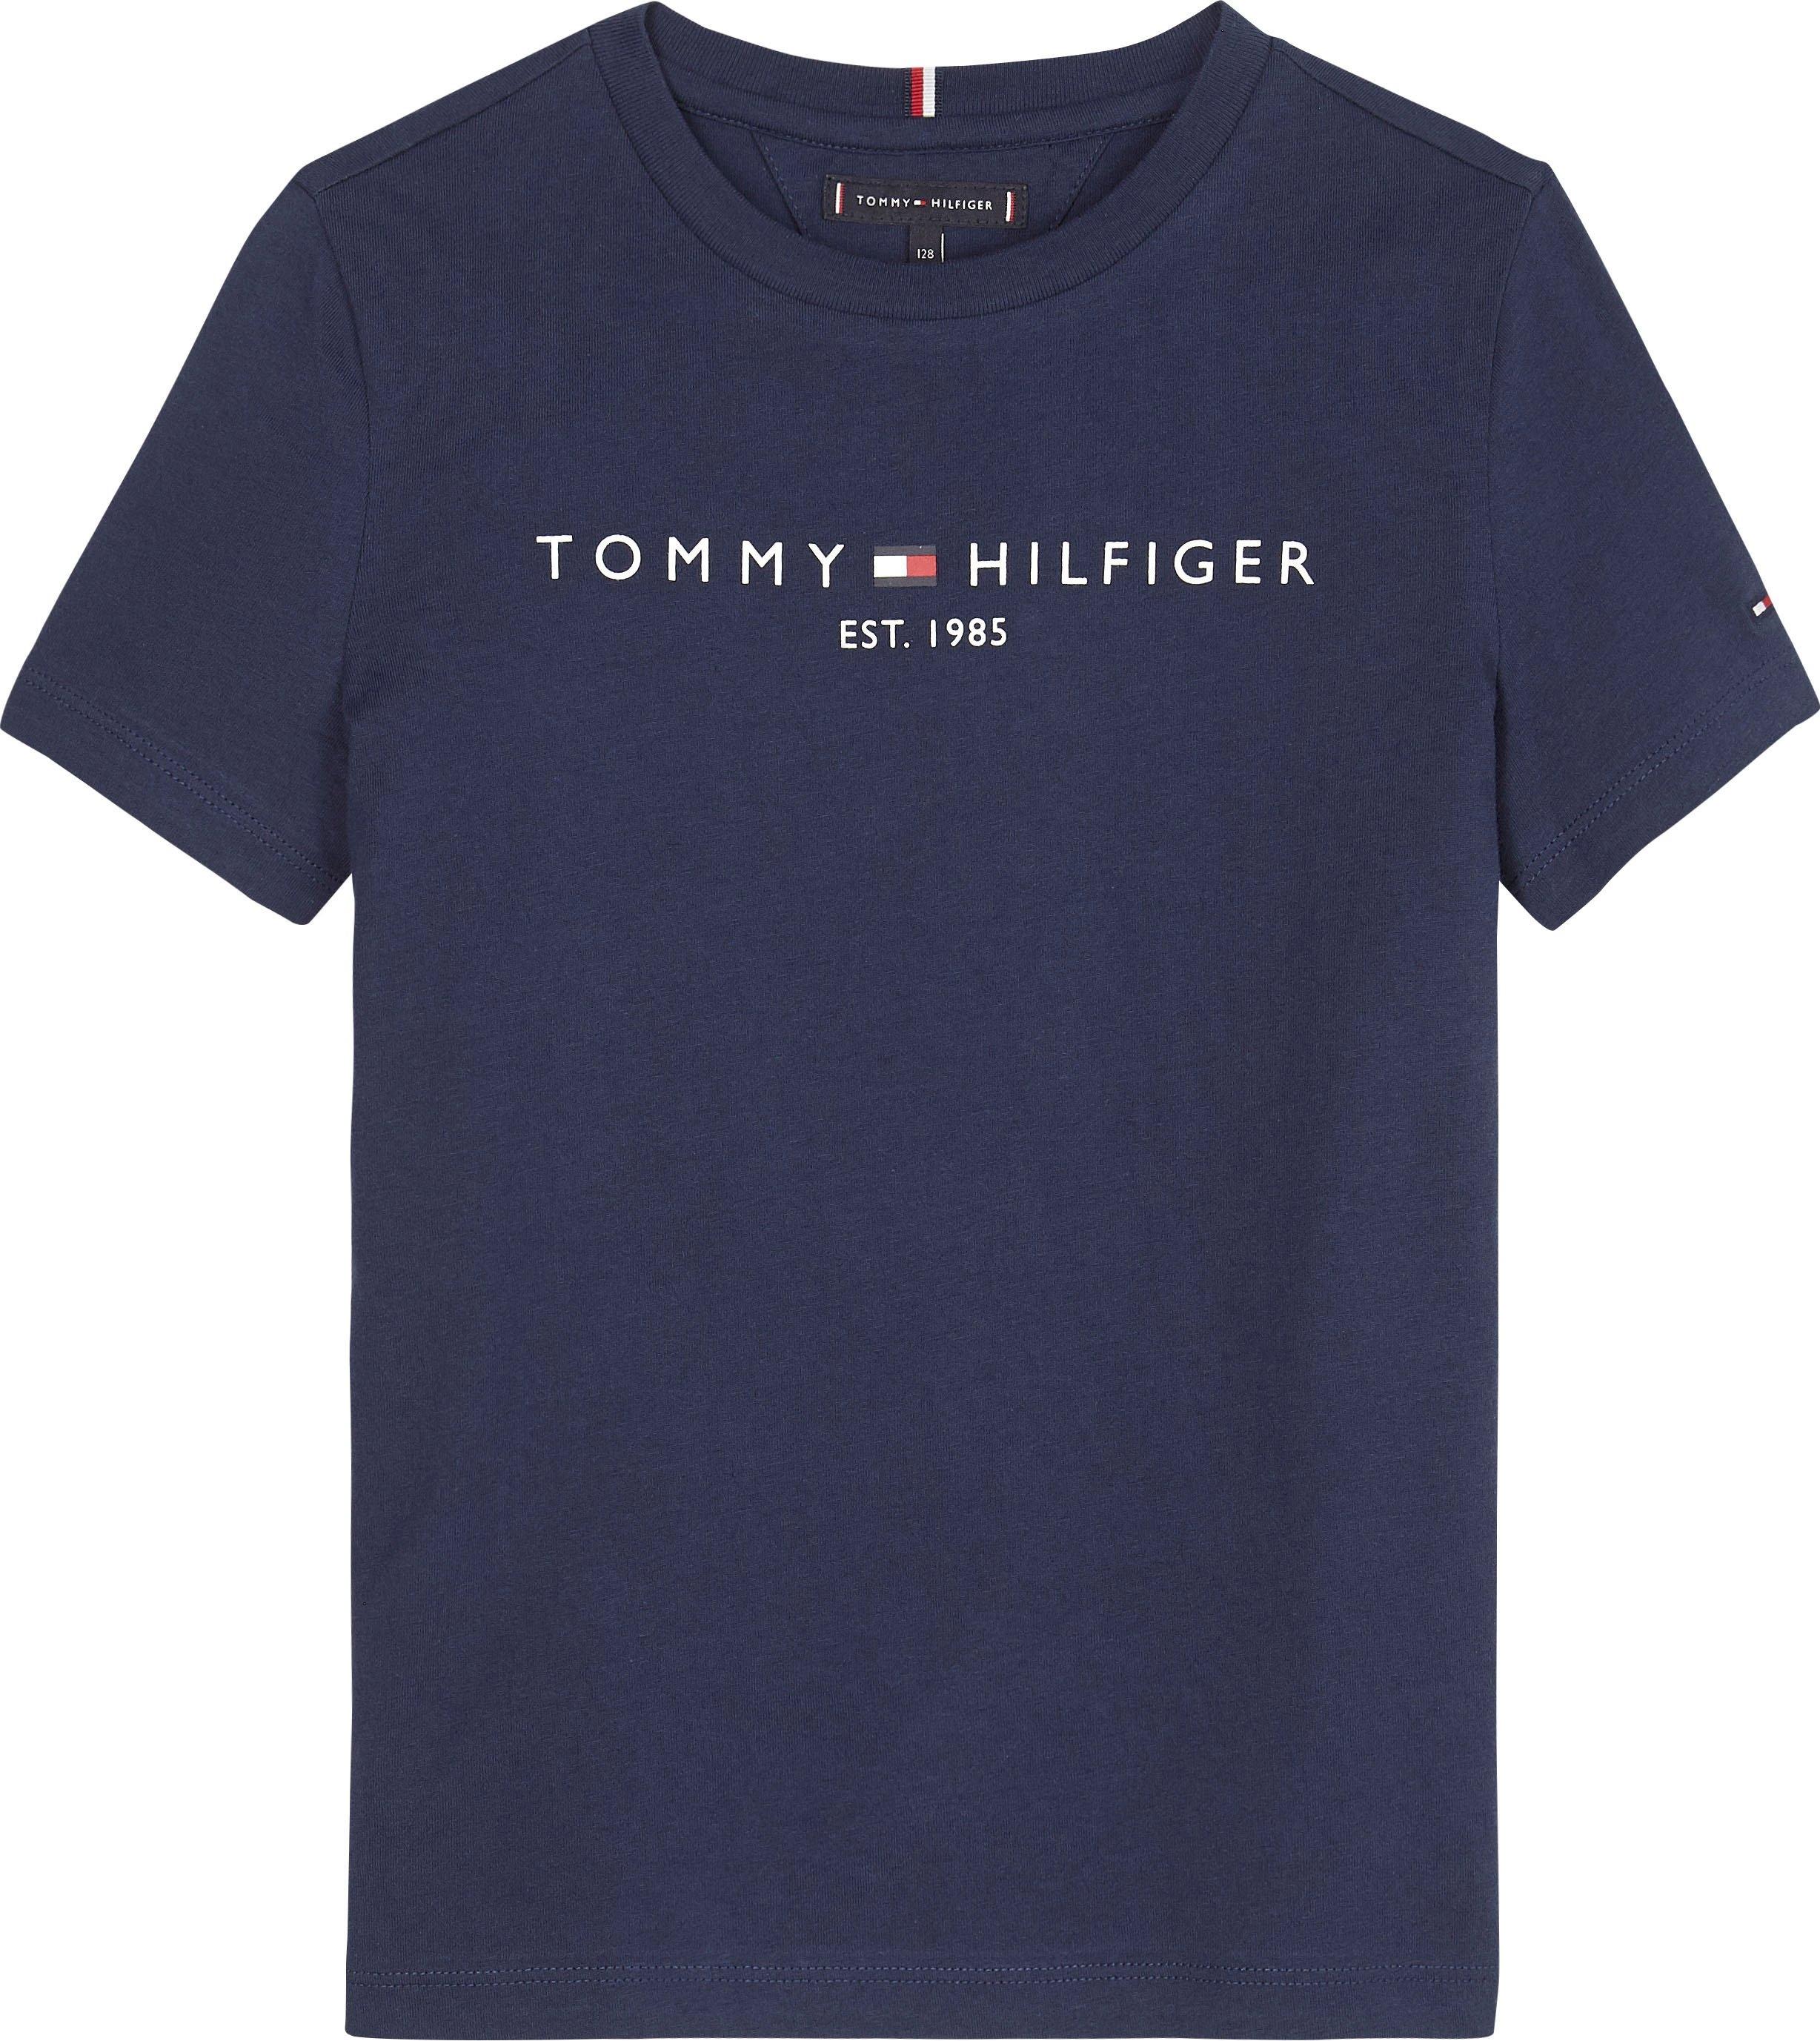 Tommy Hilfiger T-shirt bij OTTO online kopen